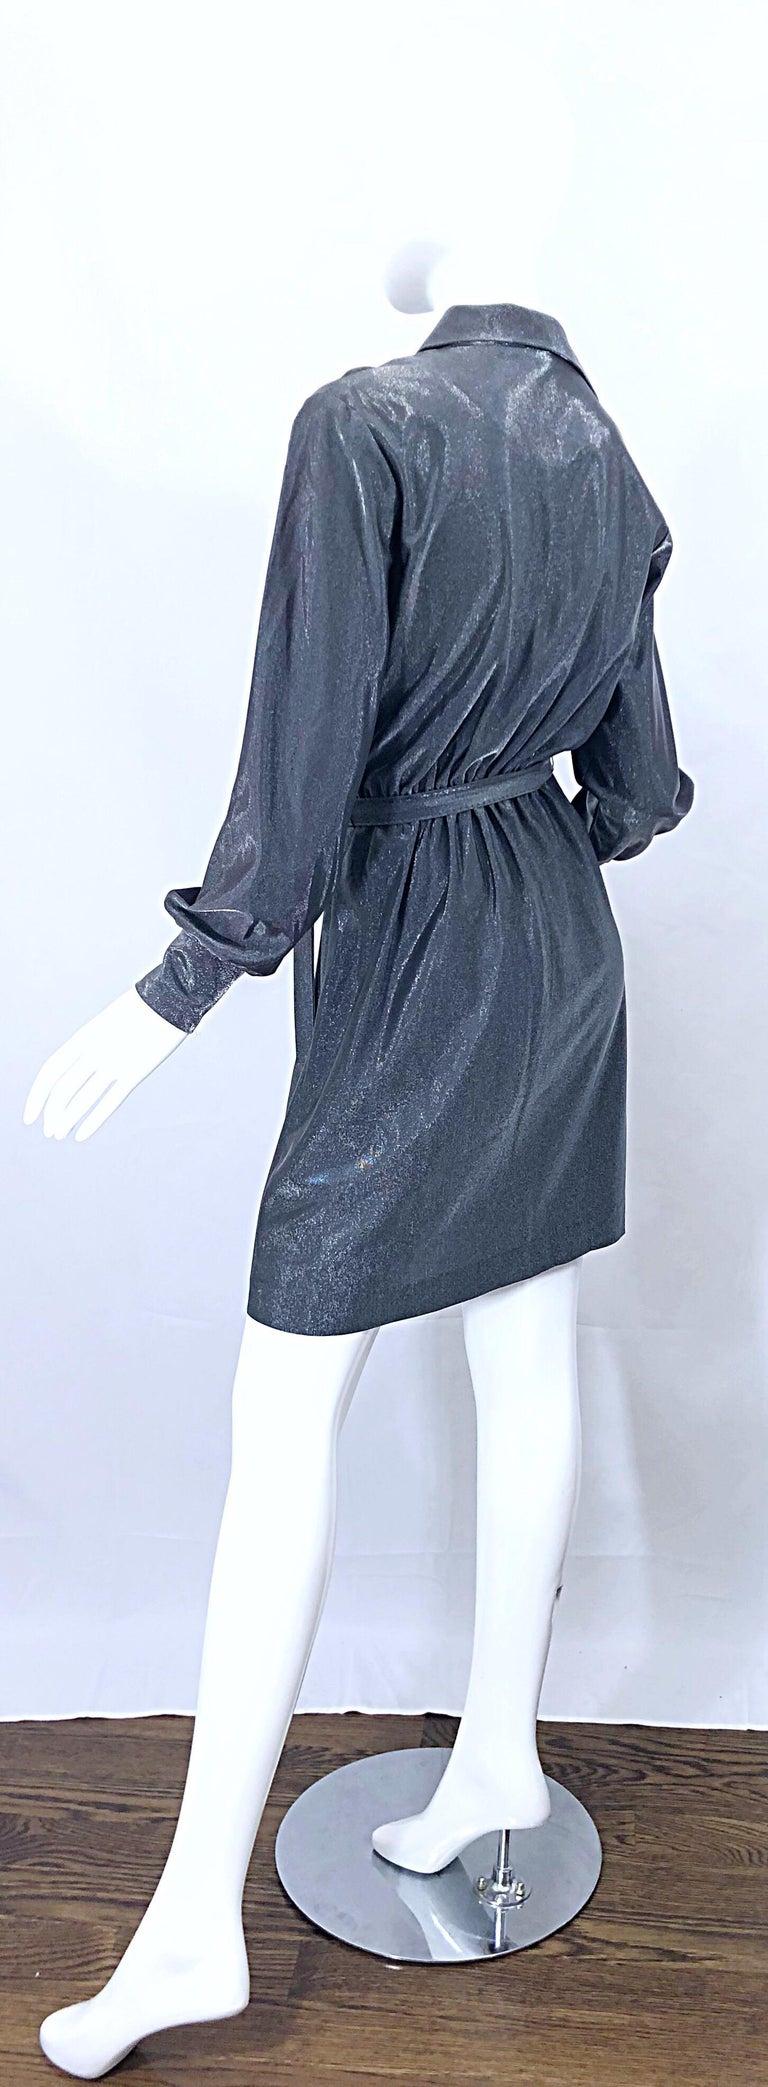 1970s Gunmetal Metallic Silver Gray Belted Vintage 70s Long Sleeve Shirt Dress For Sale 11